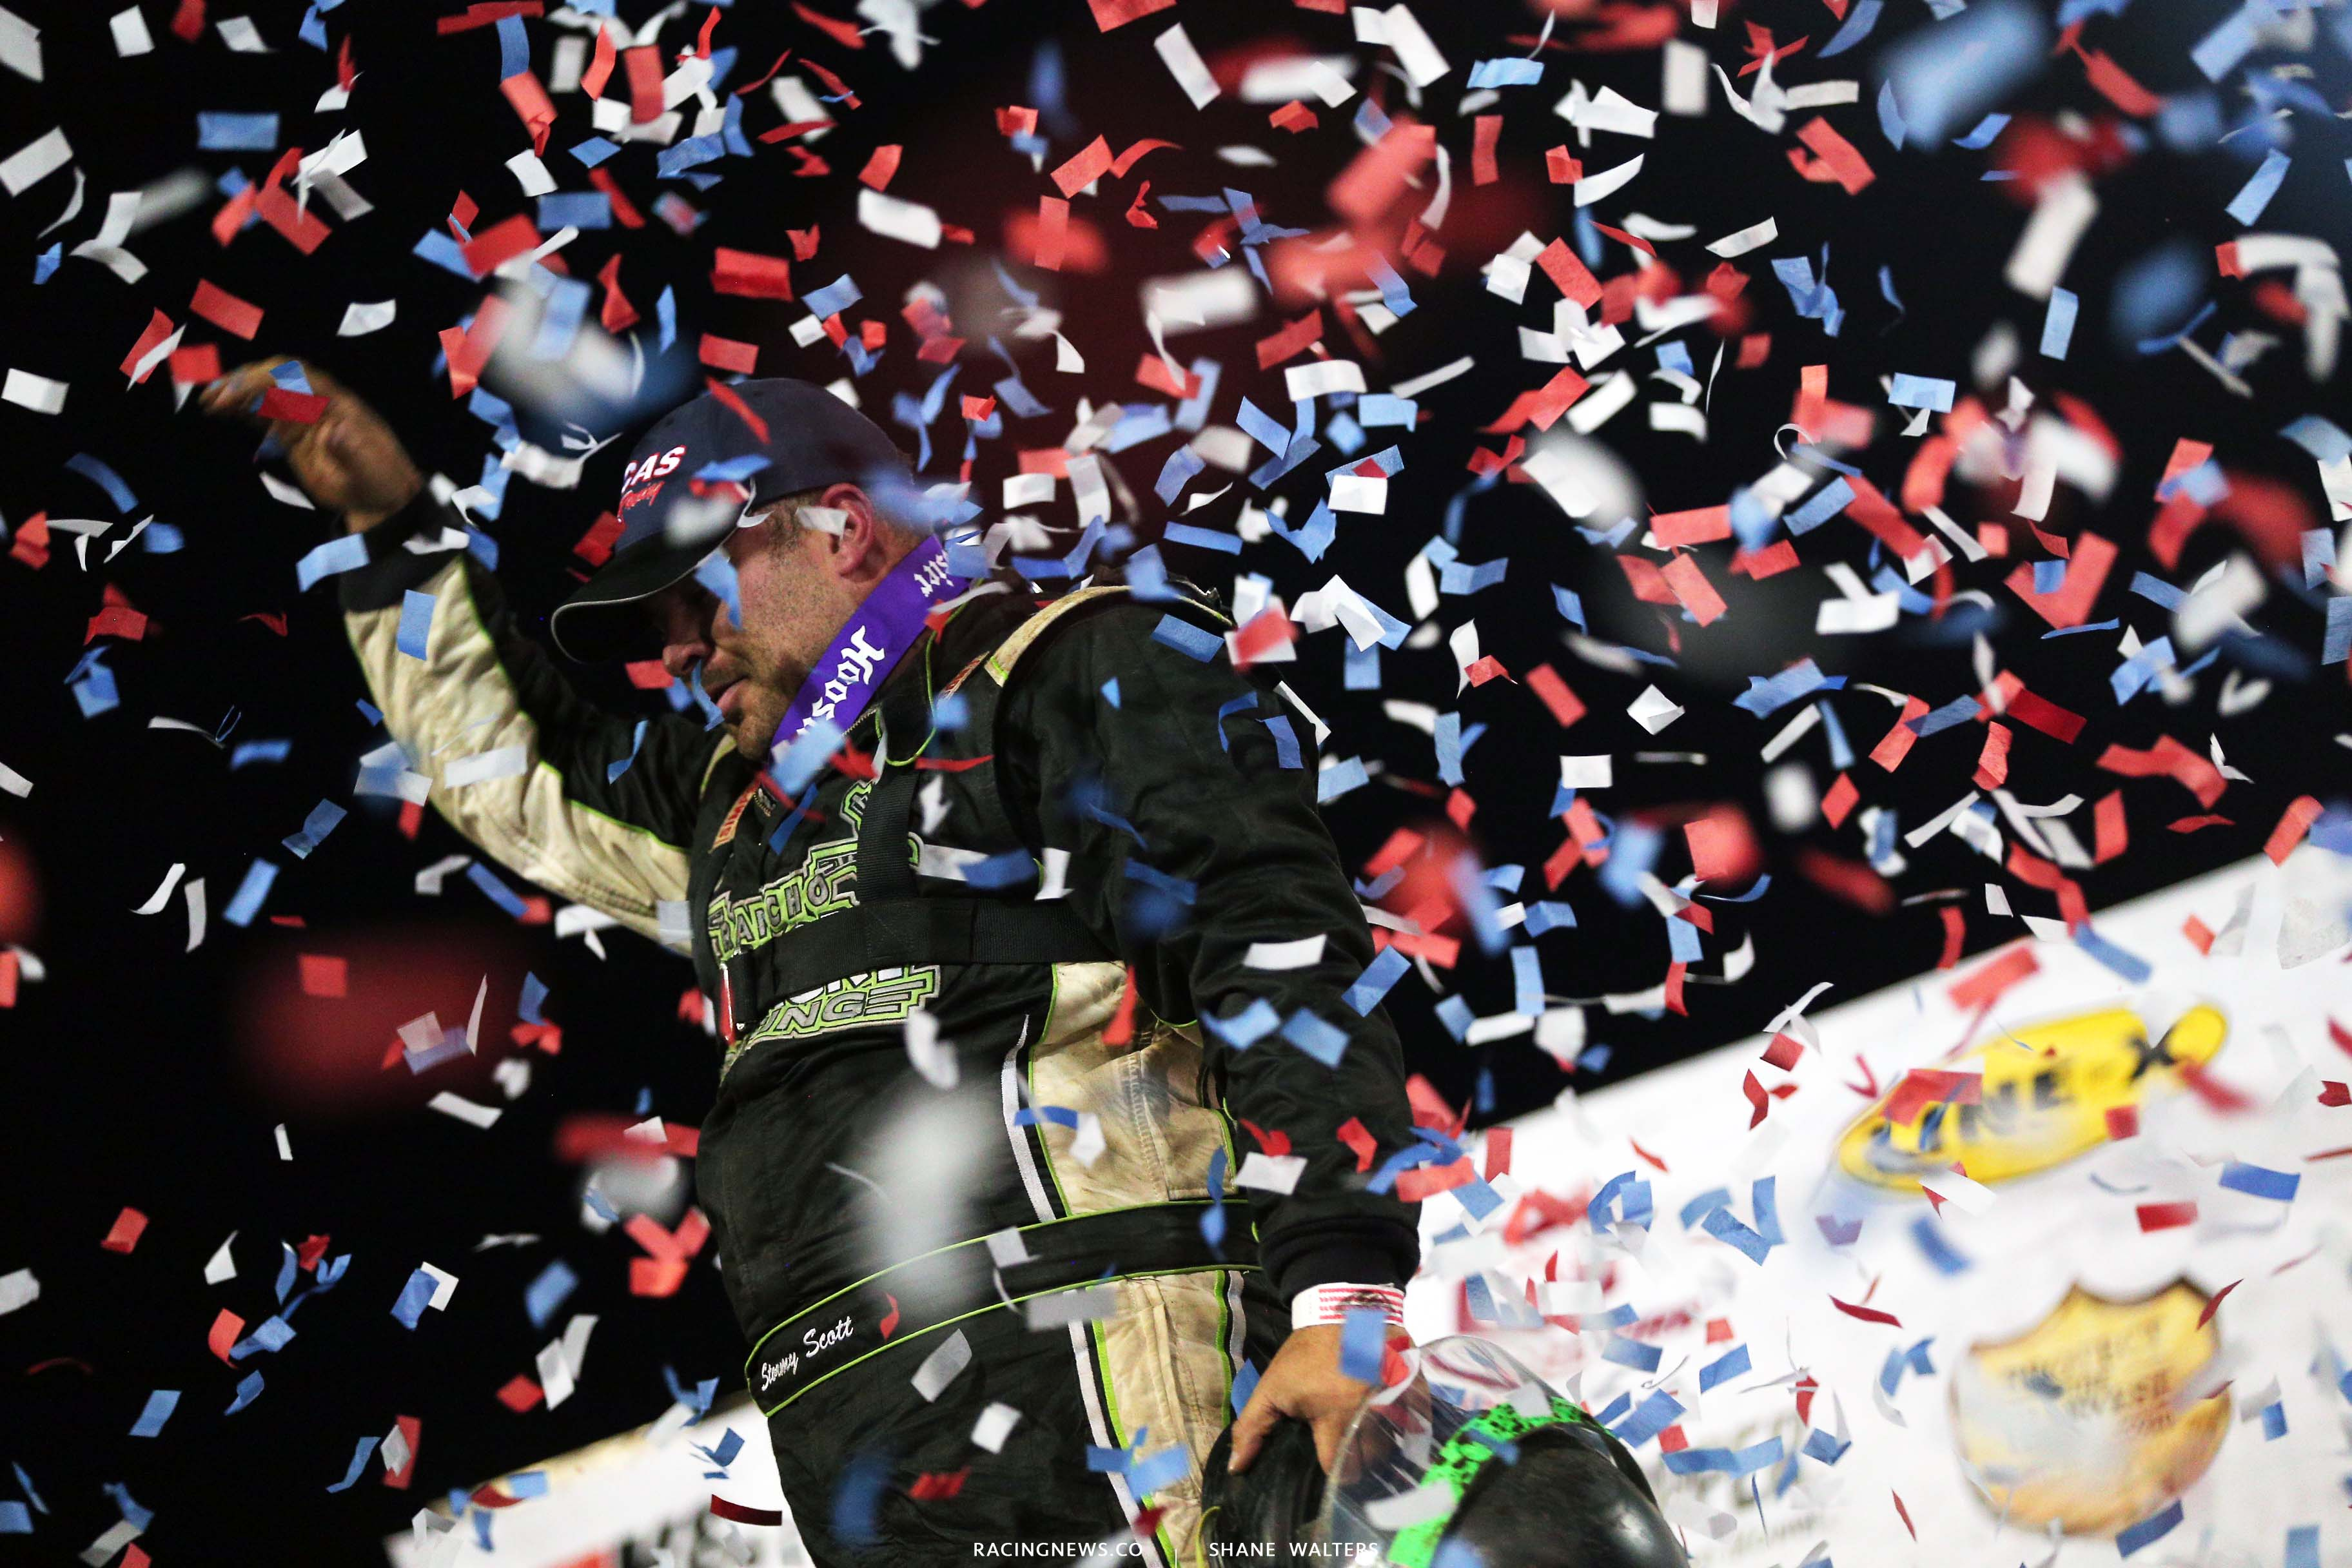 Stormy Scott in victory lane at East Bay Raceway Park - Lucas Oil Late Model Dirt Series 8193